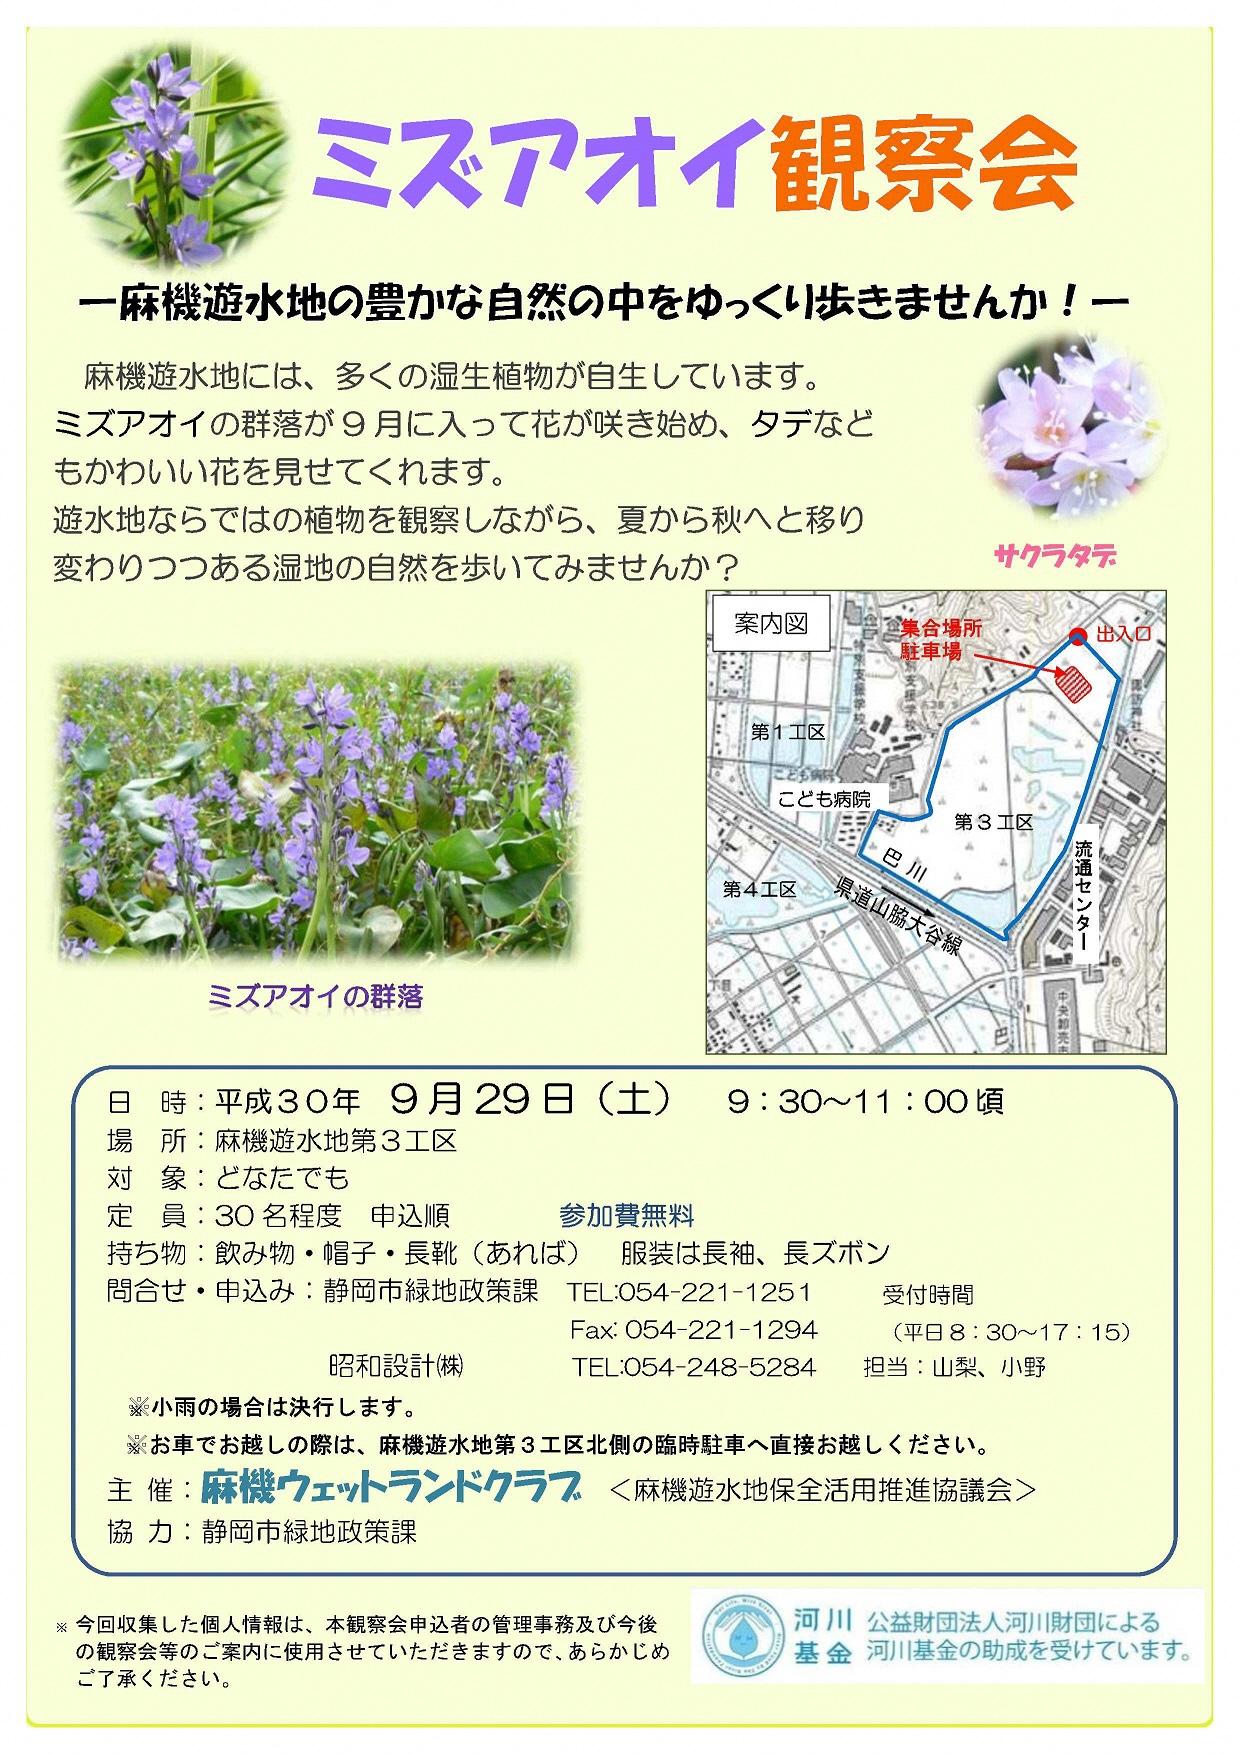 http://www.shizutan.jp/learning/2018/09/07/images/%E3%83%9F%E3%82%BA%E3%82%A2%E3%82%AA%E3%82%A4%E8%A6%B3%E5%AF%9F%E4%BC%9A-1.jpg